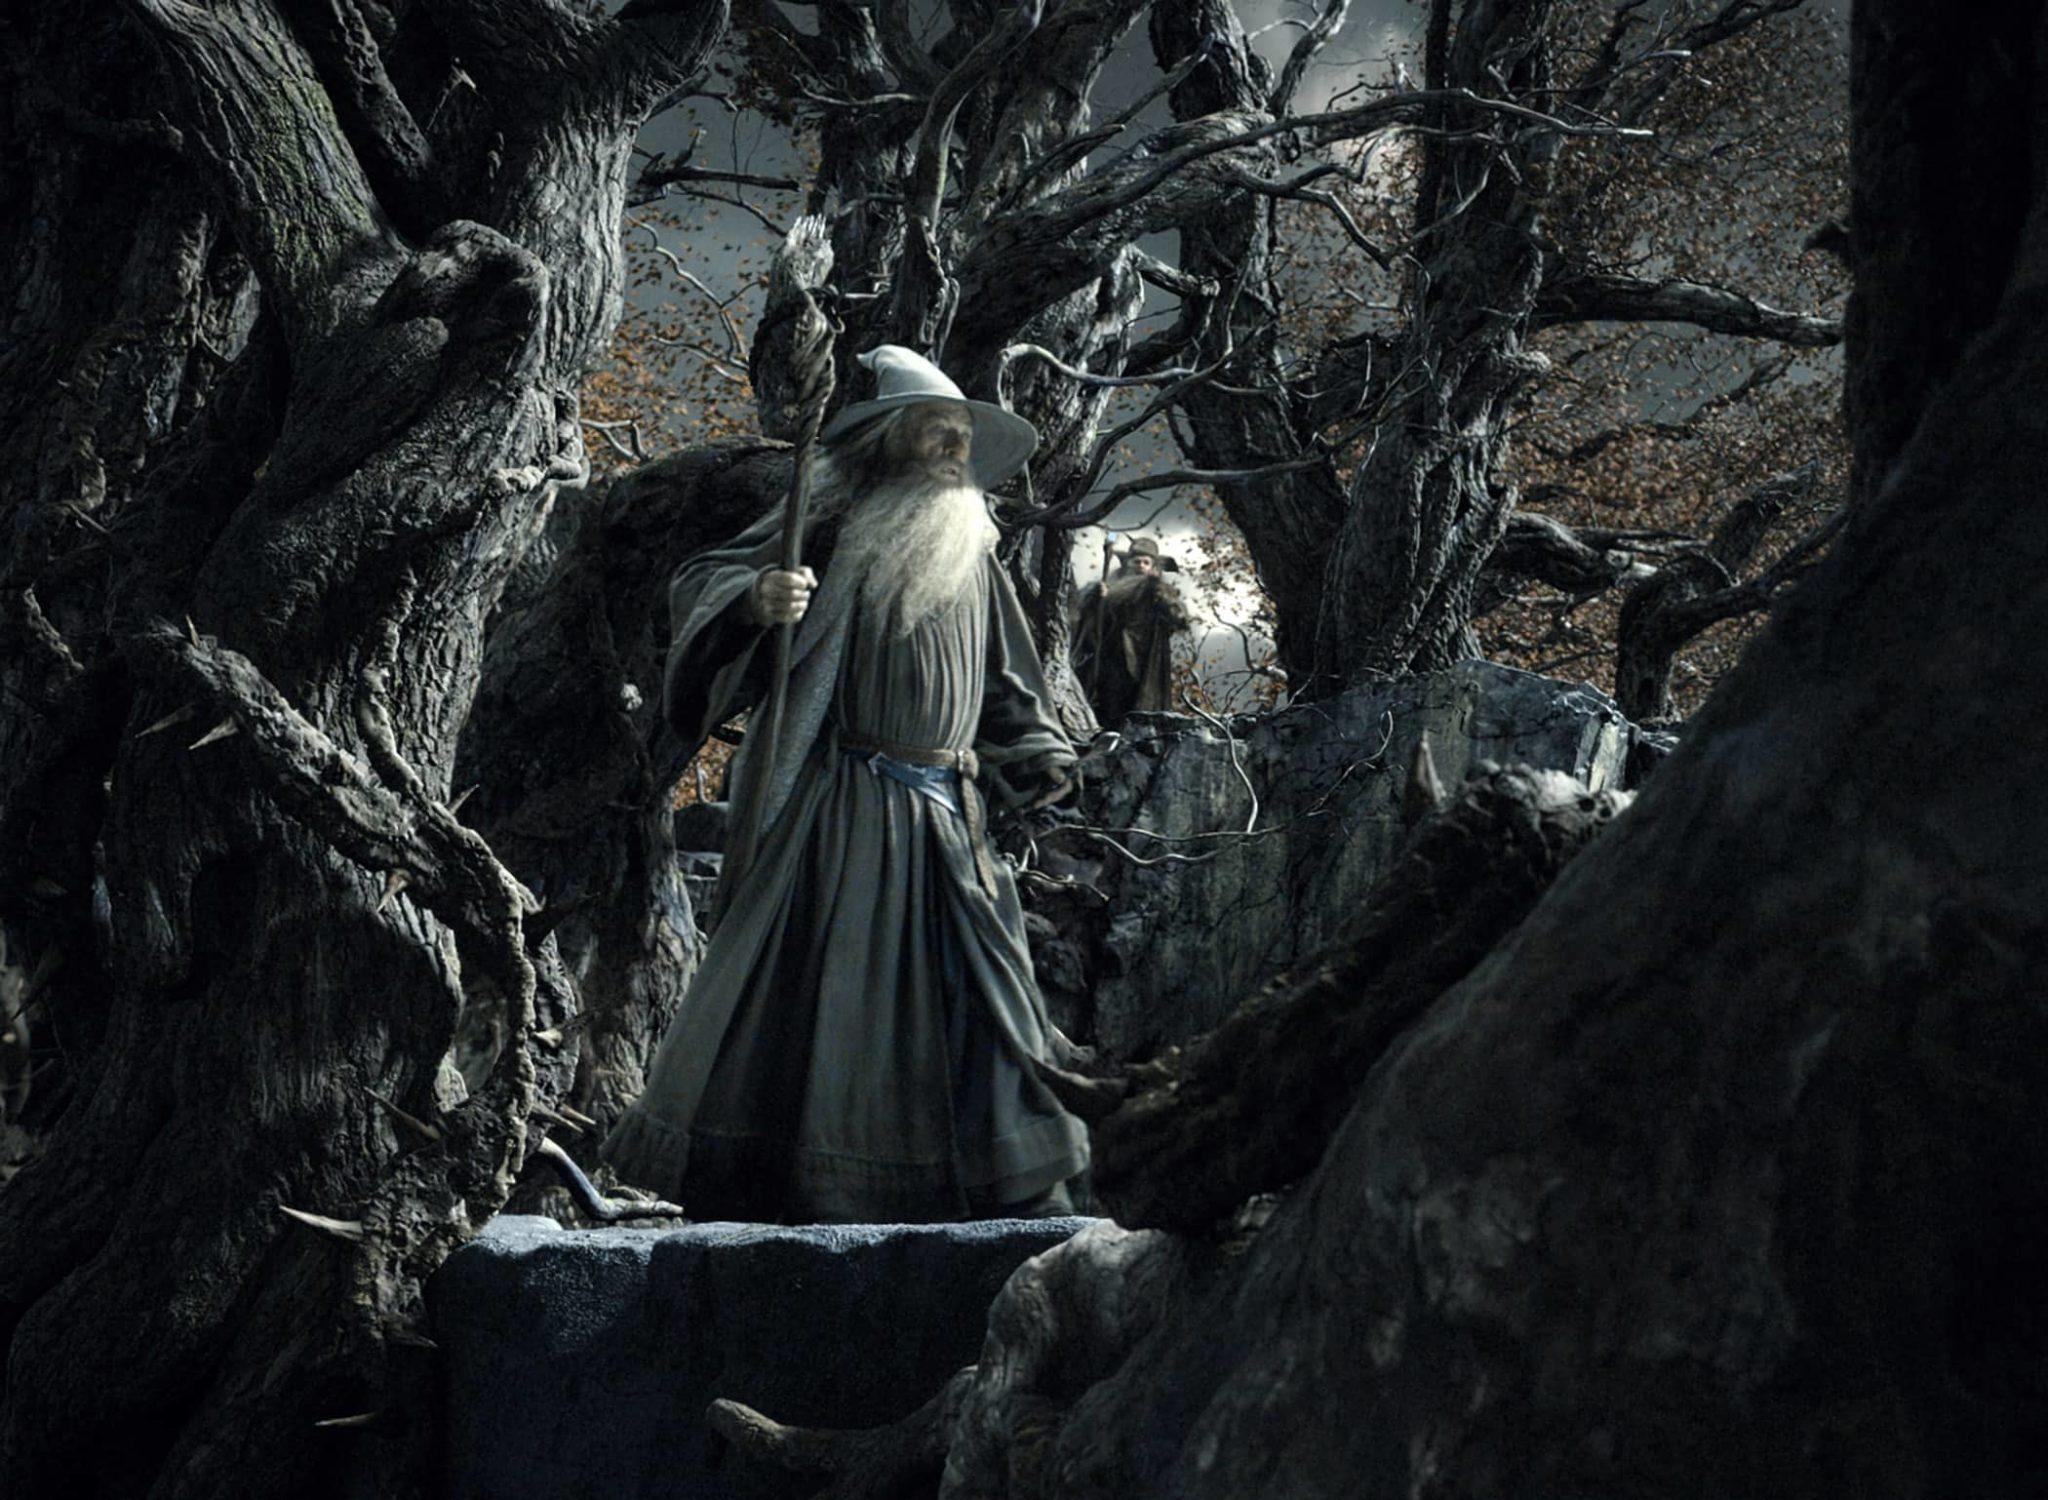 hobbit-desolation-of-smaug-ian-mckellan-2